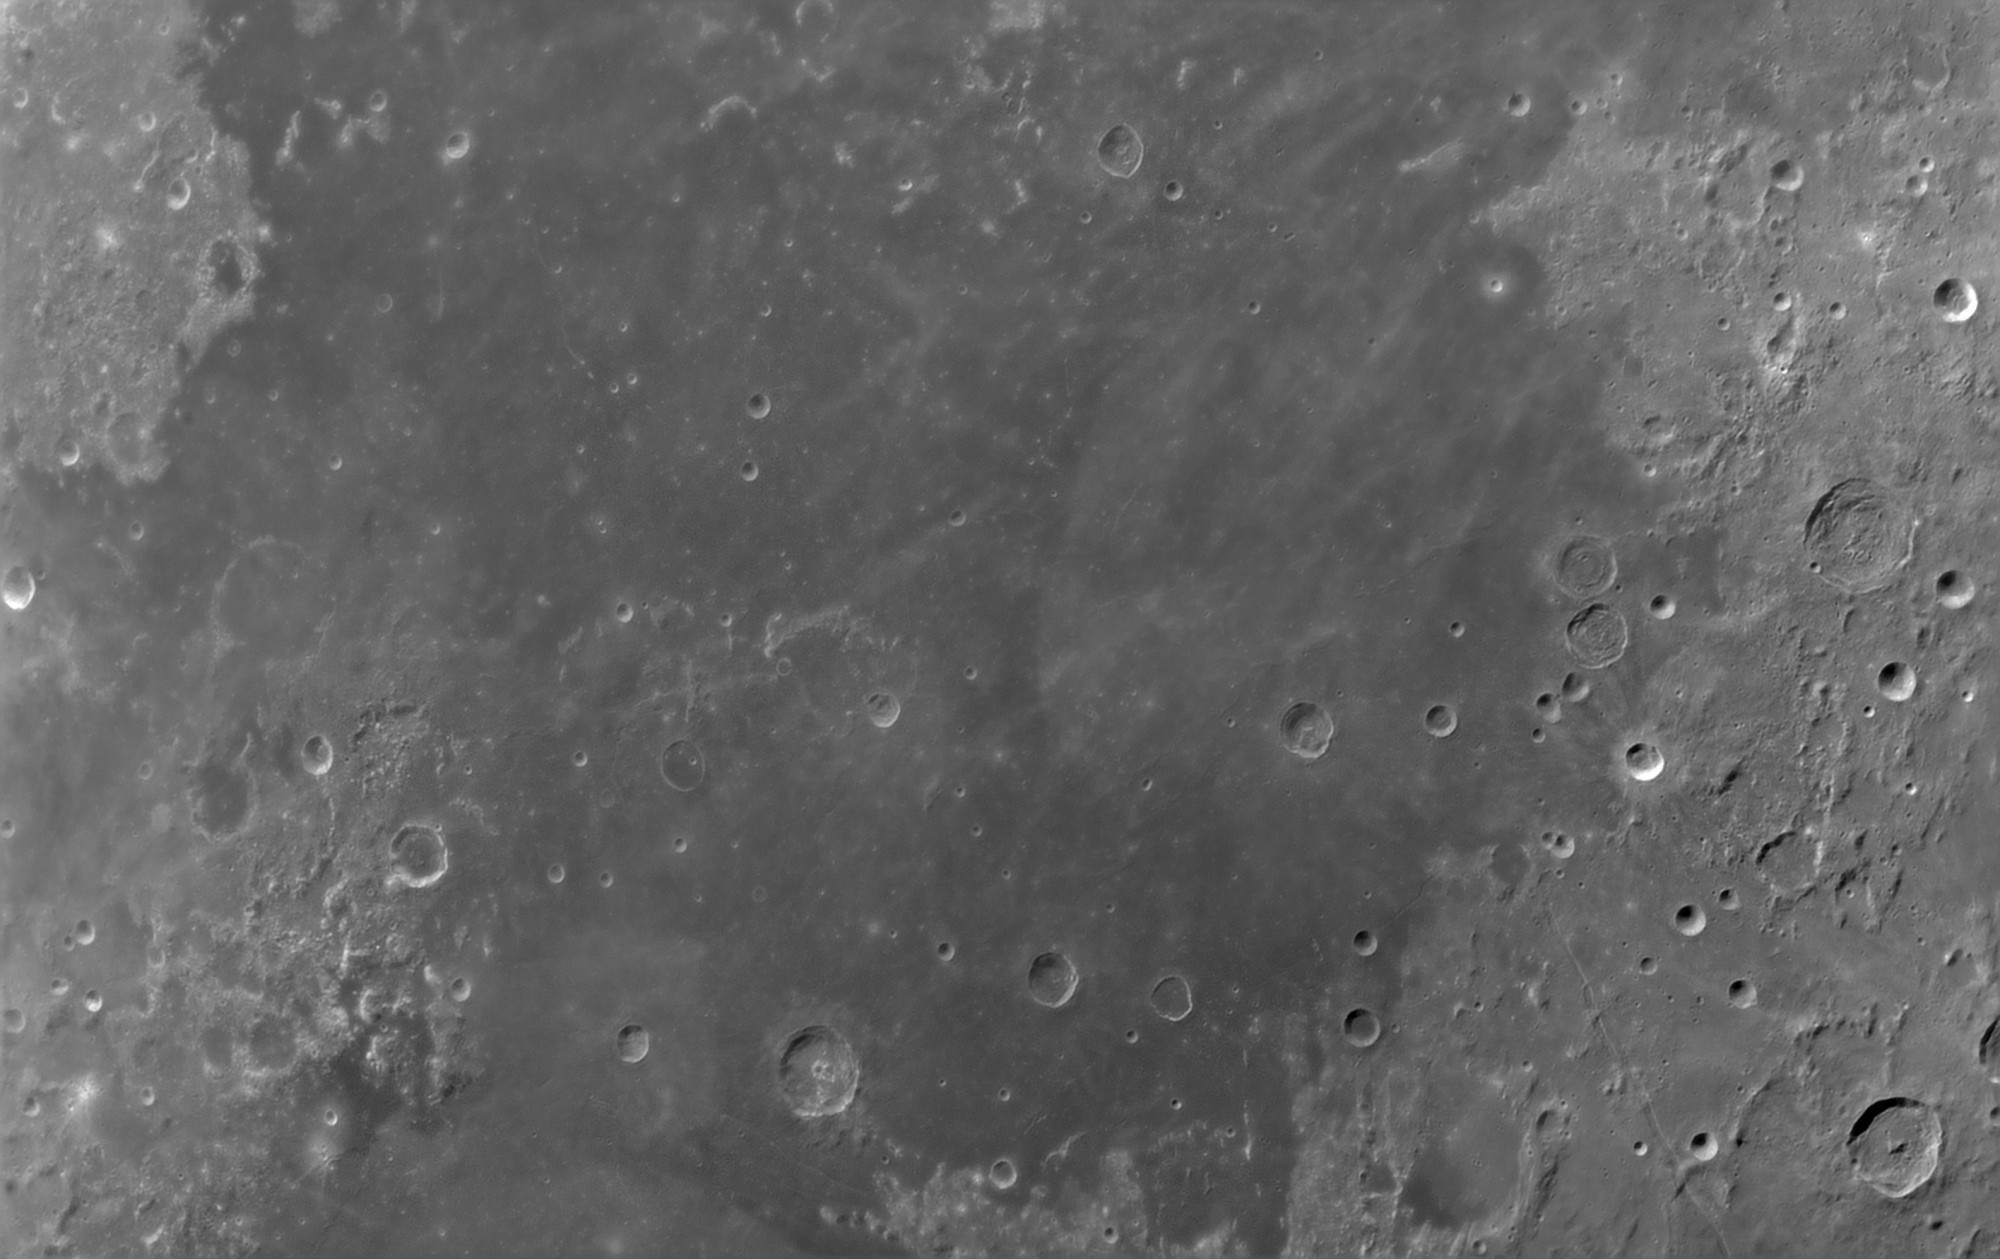 lune8.jpg